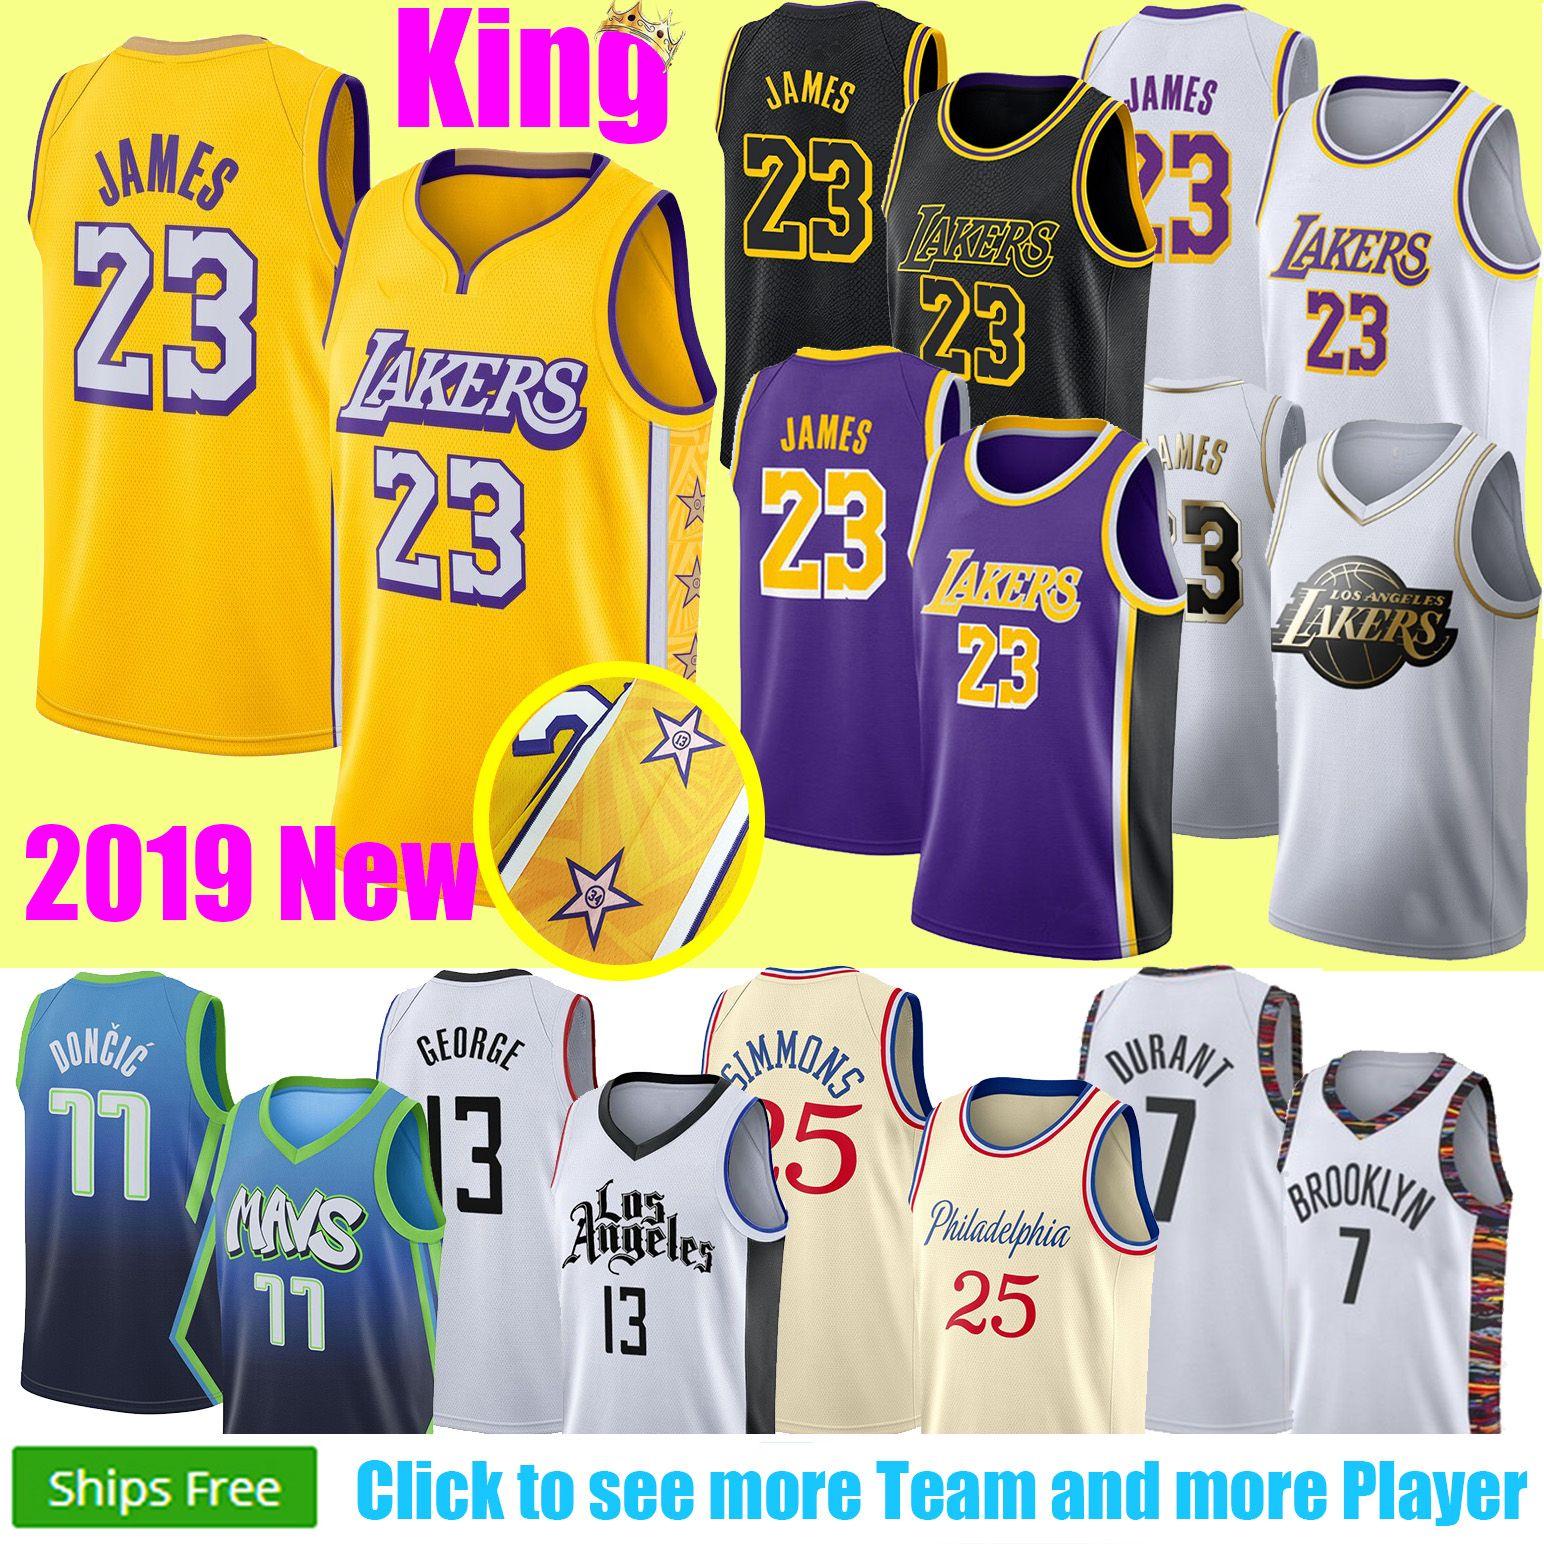 NCAA 2019 2020 König LeBron James 23 6 James Anthony 3 Davis 0 Kuzma 2 Howard 39 Doncic 77 Wade 3 George 13 Leonard 2 Irving 11 Durant 7